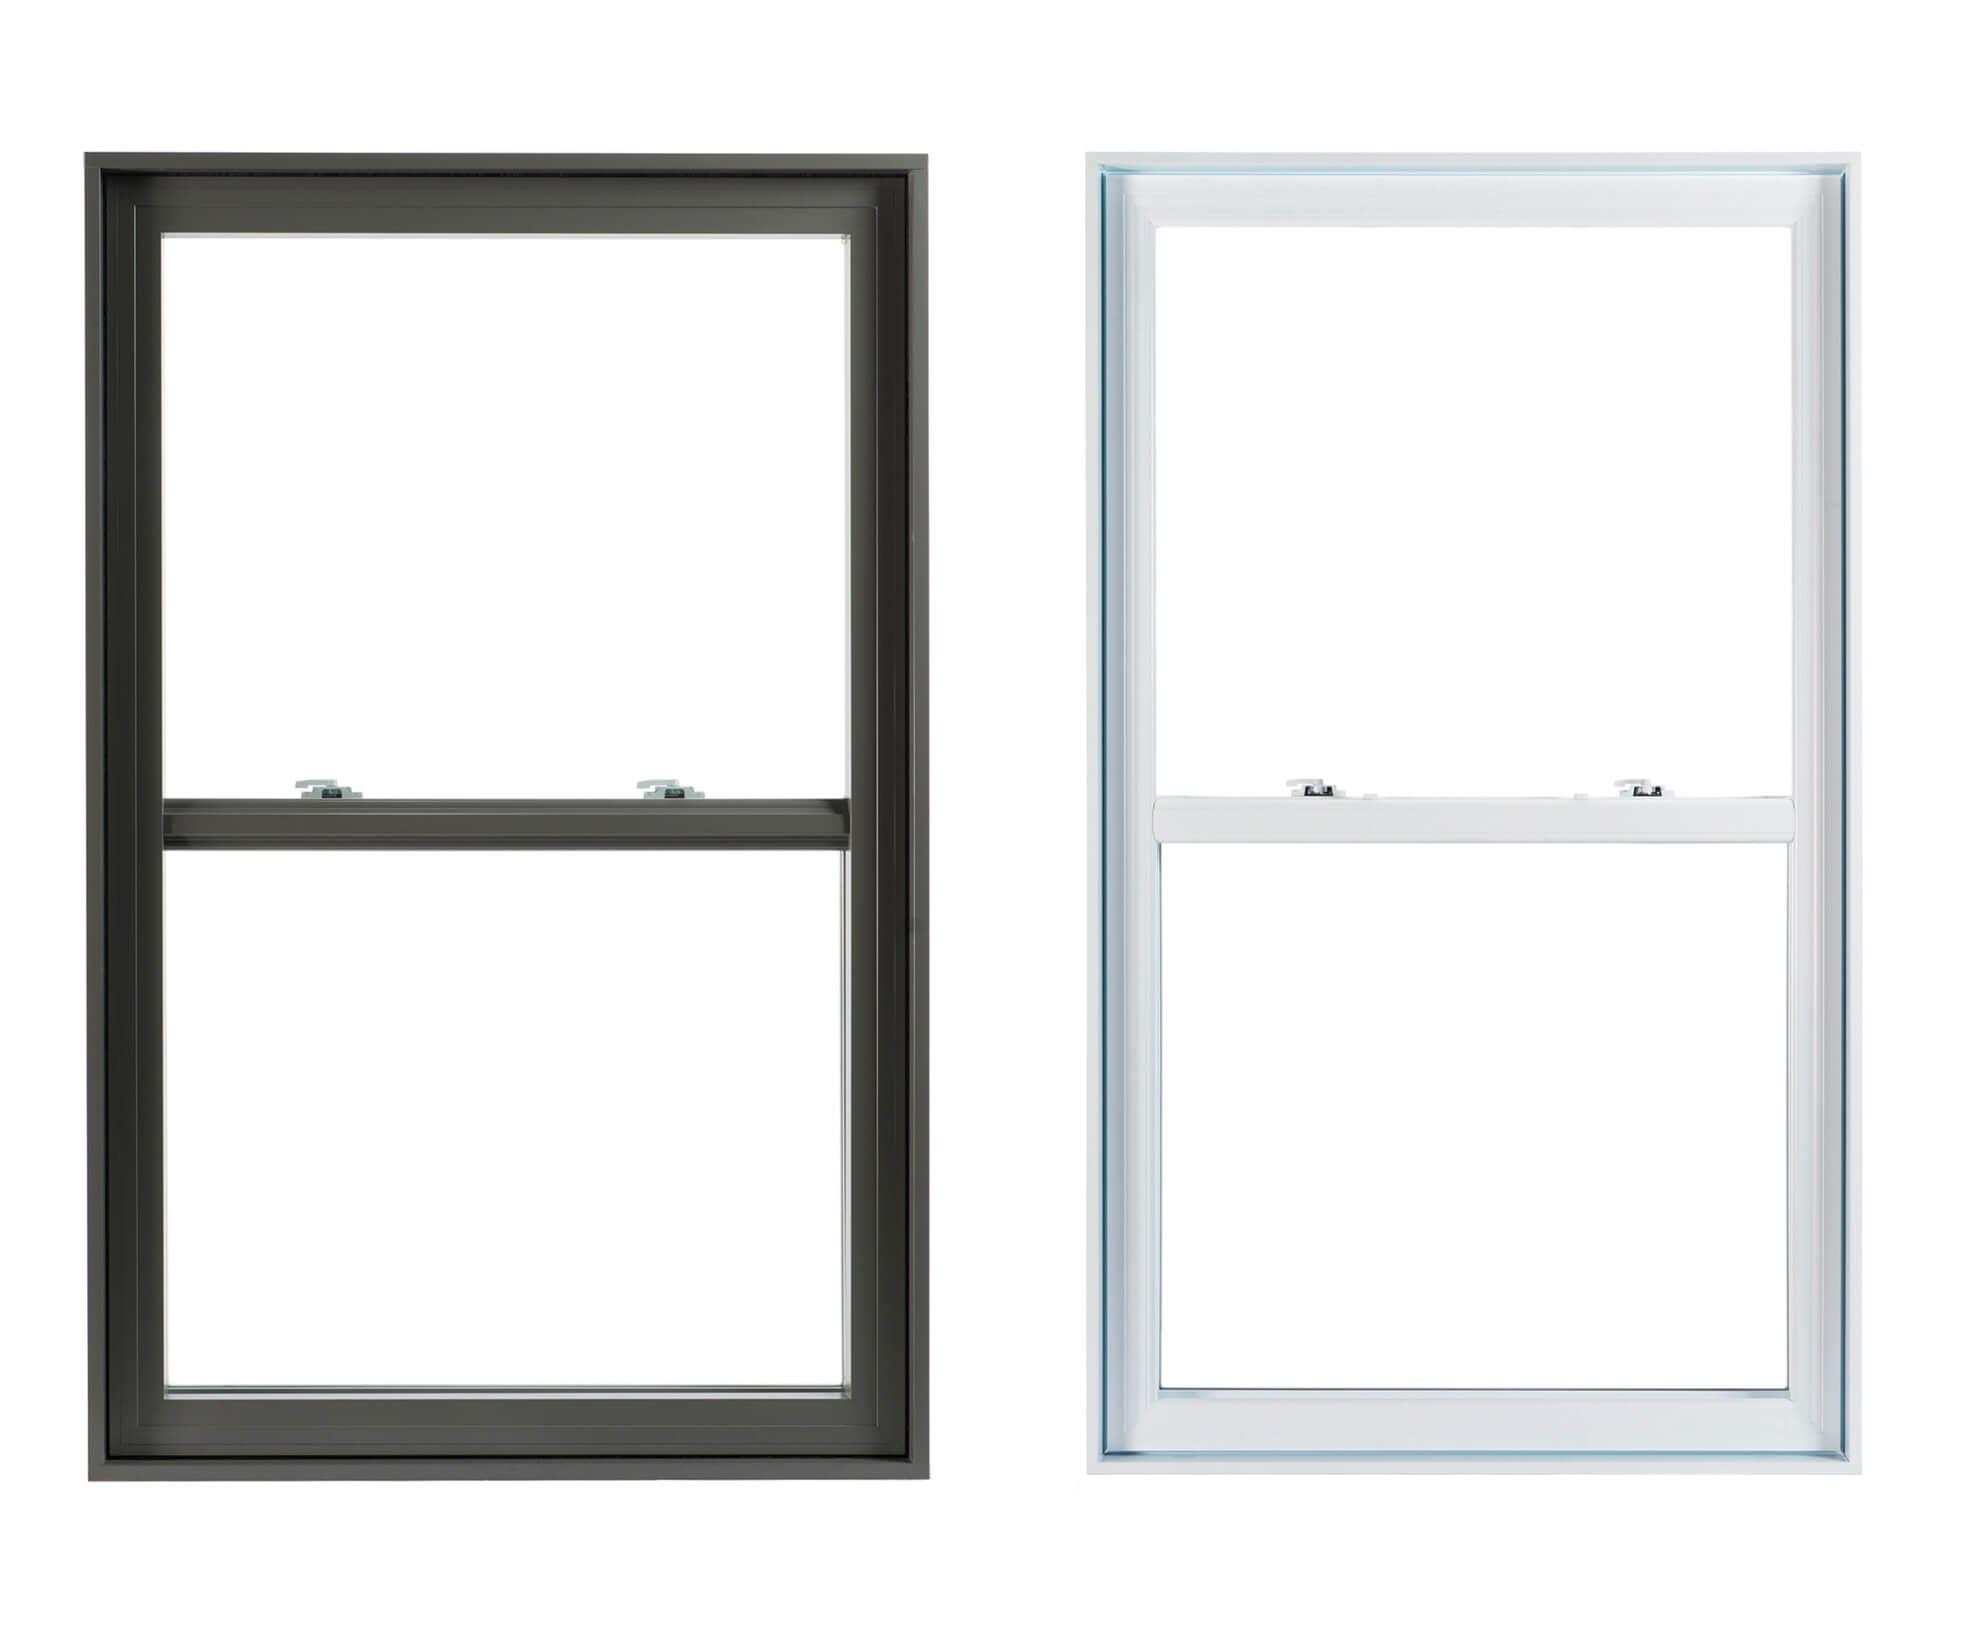 pvc and aluminium double-hung windows